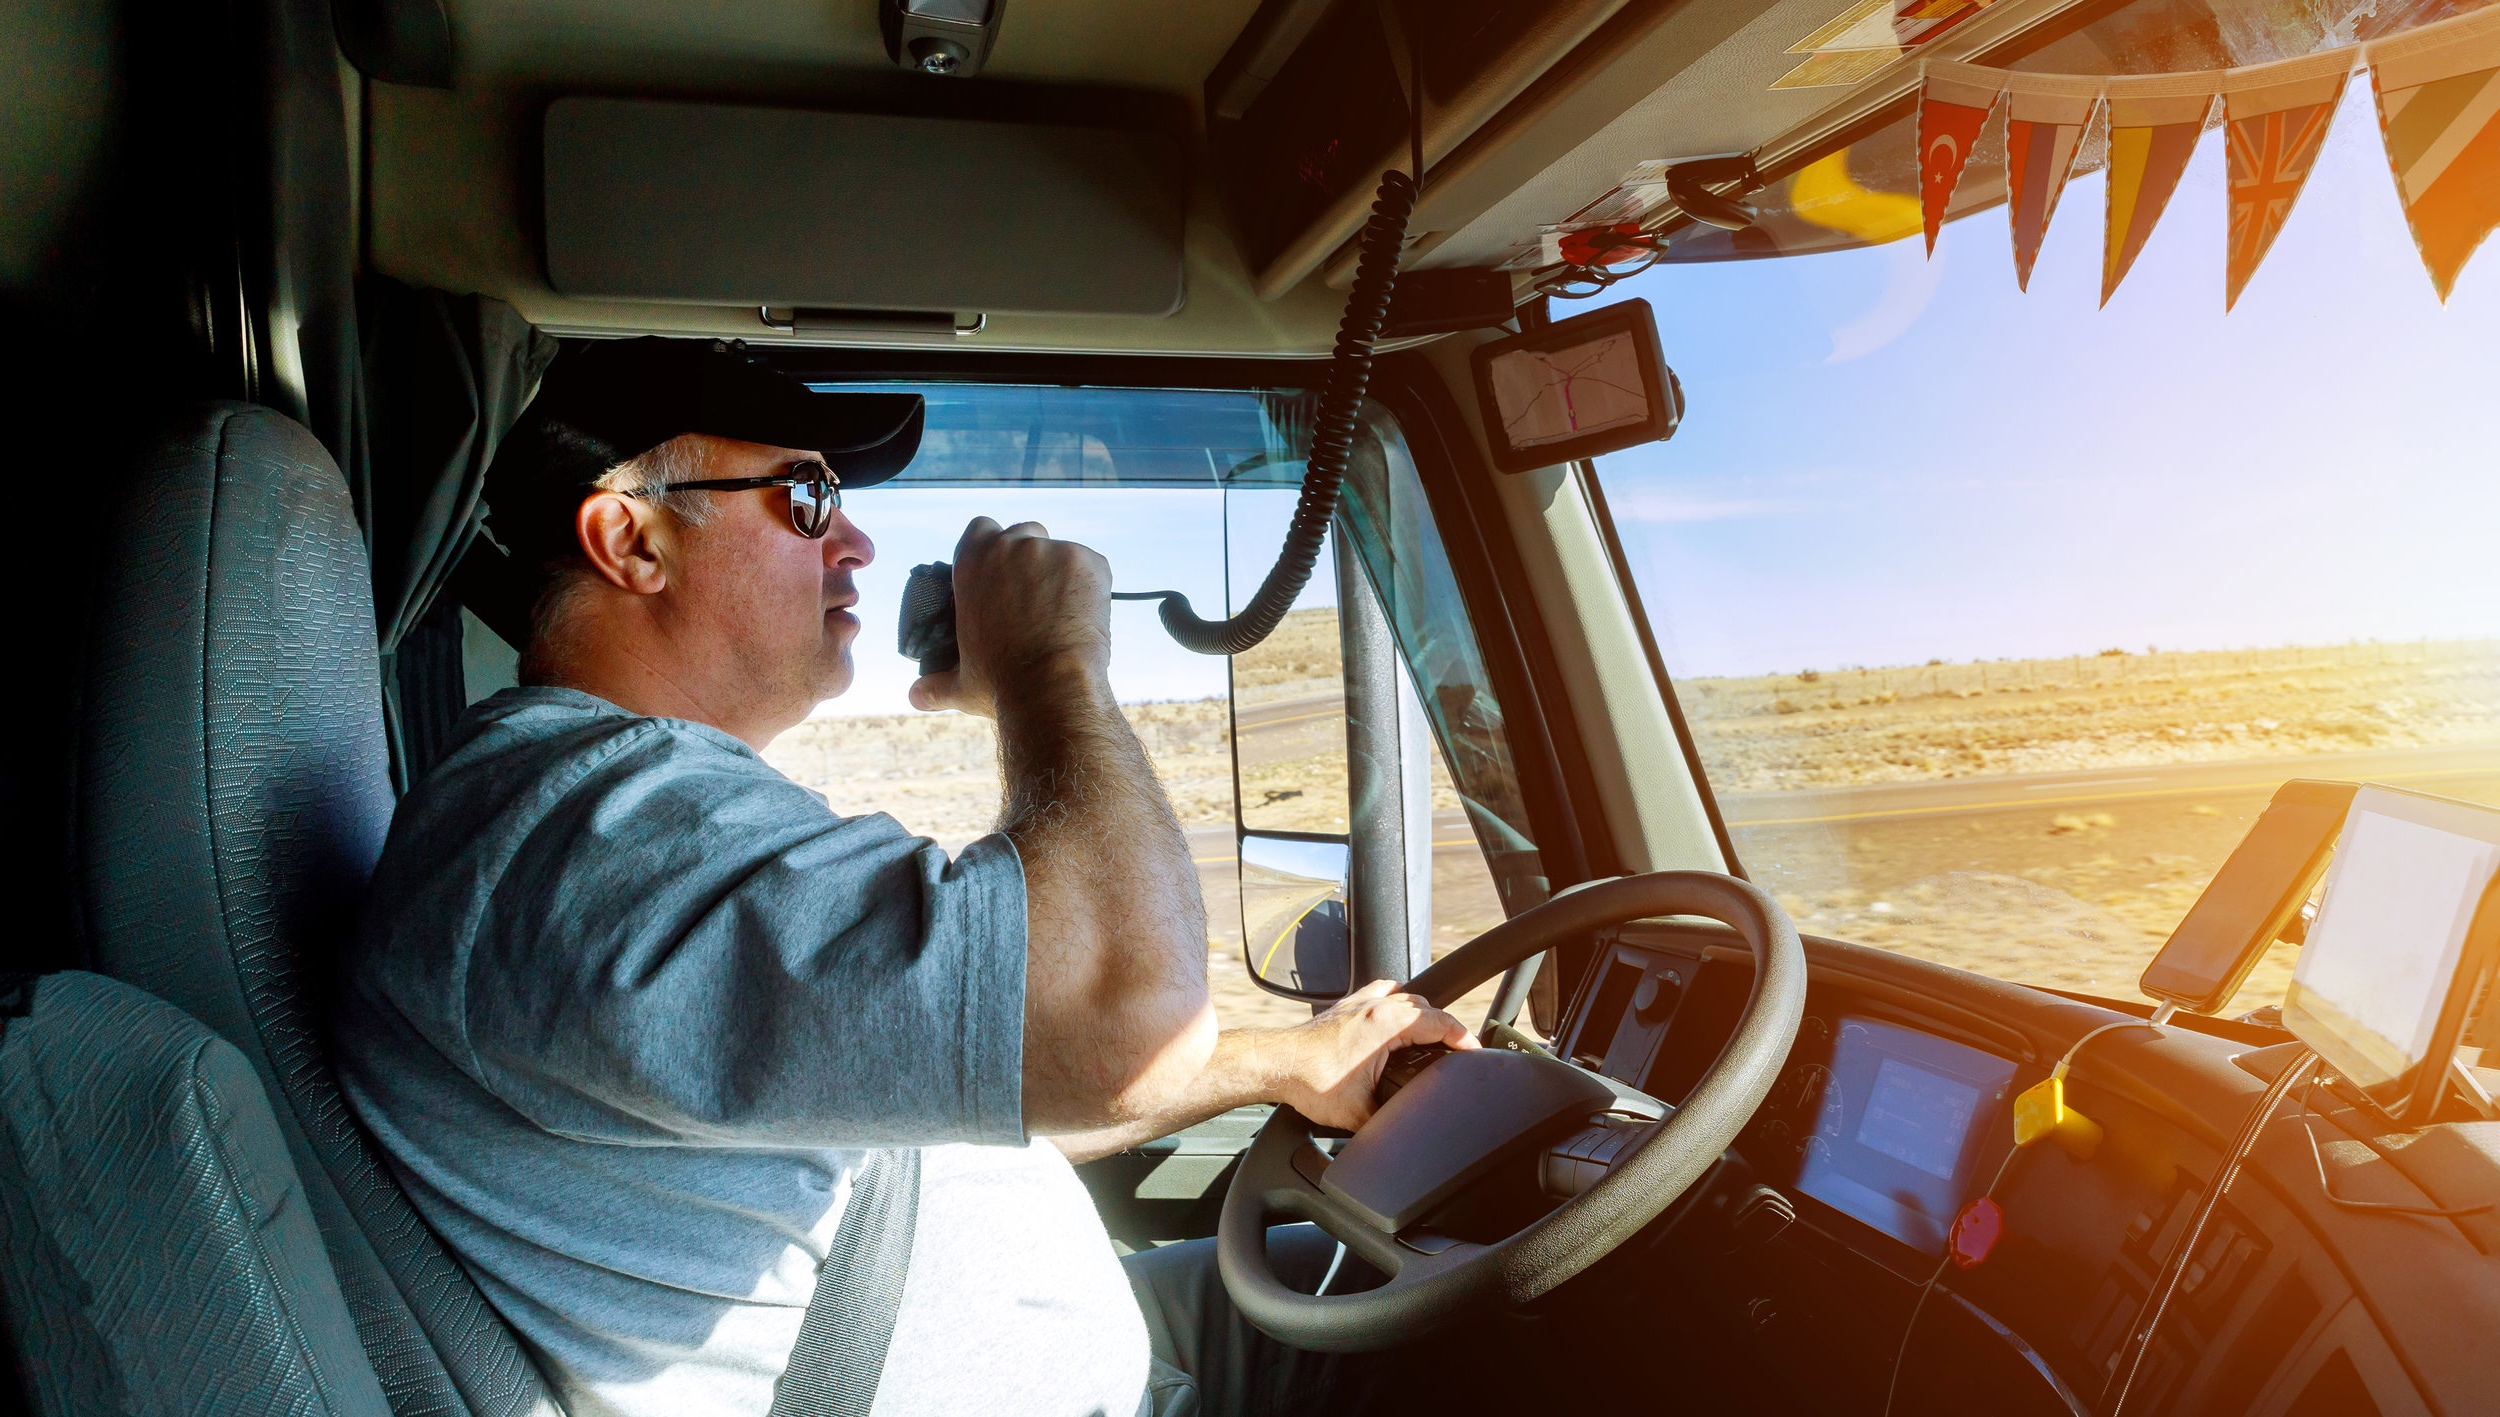 guy-driving-truck-western-pacific.jpg